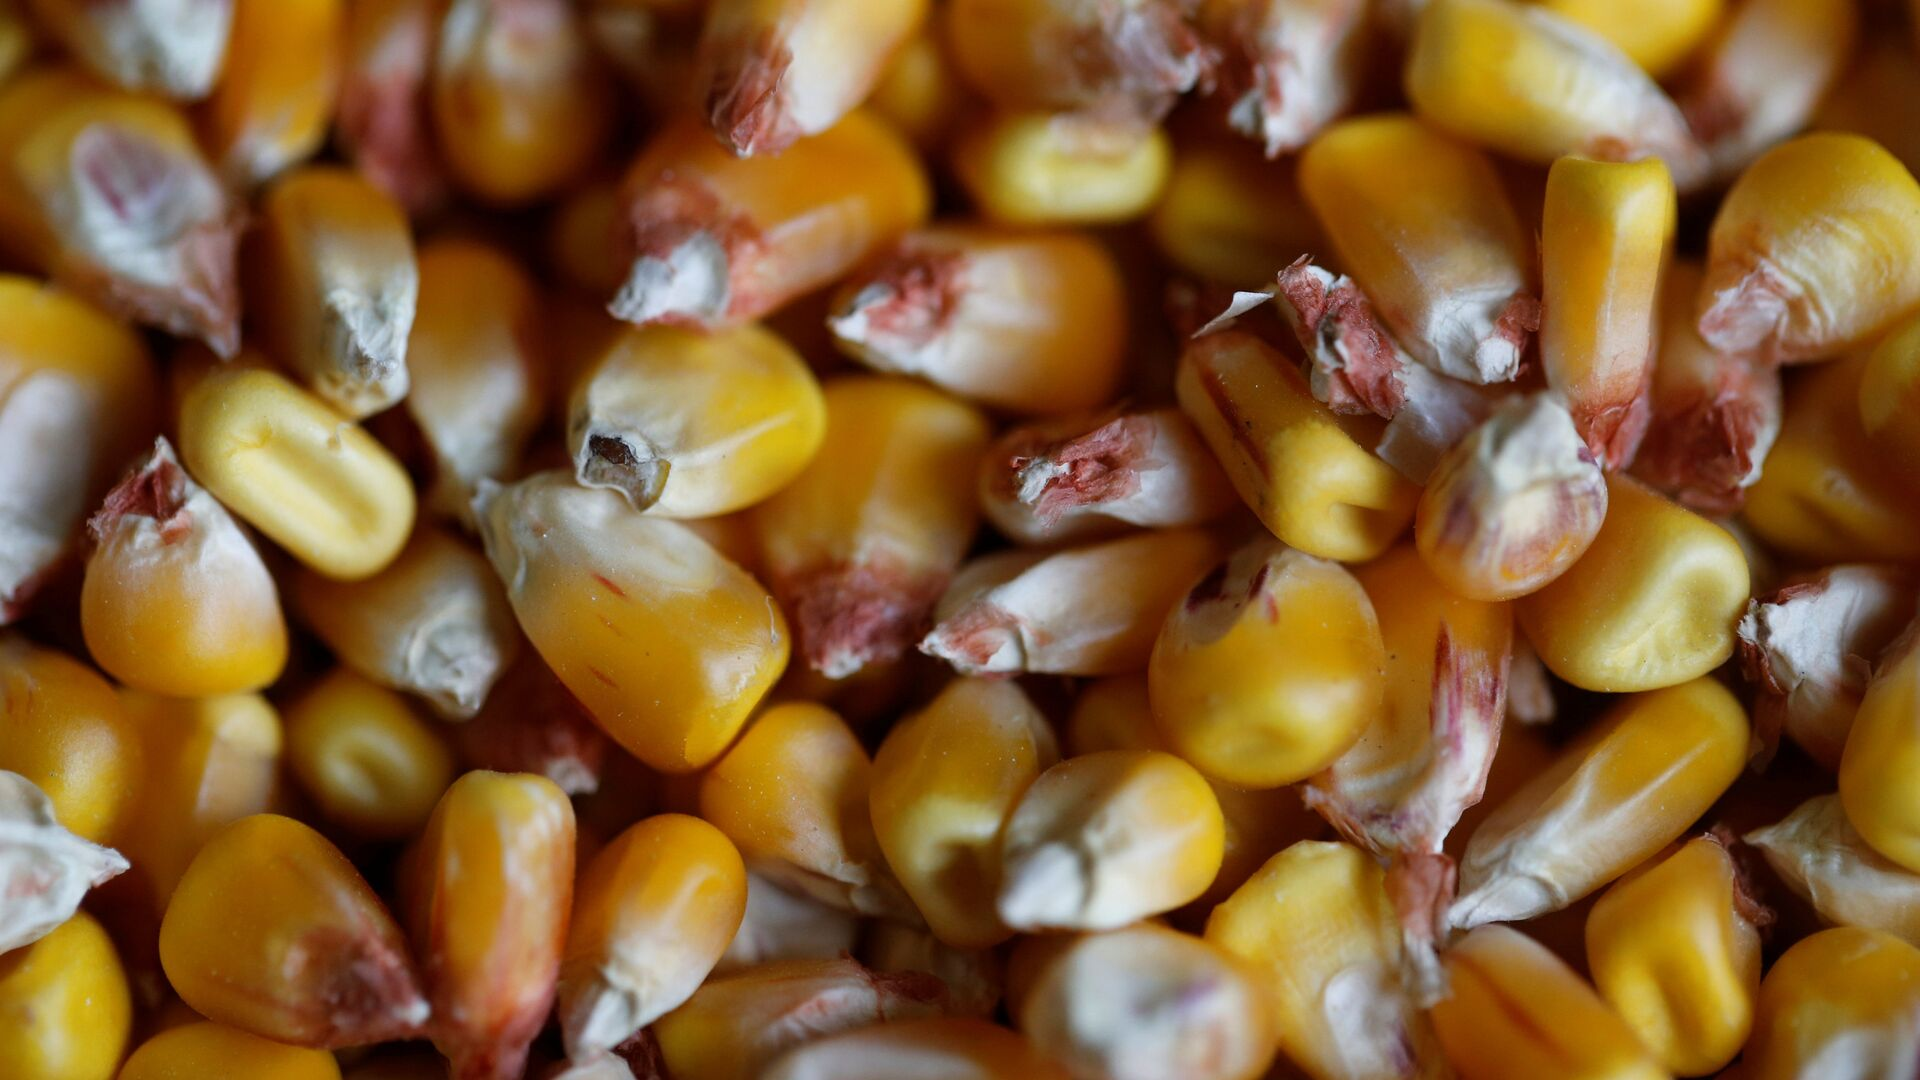 Granos de maíz (imágen referencial) - Sputnik Mundo, 1920, 14.10.2021